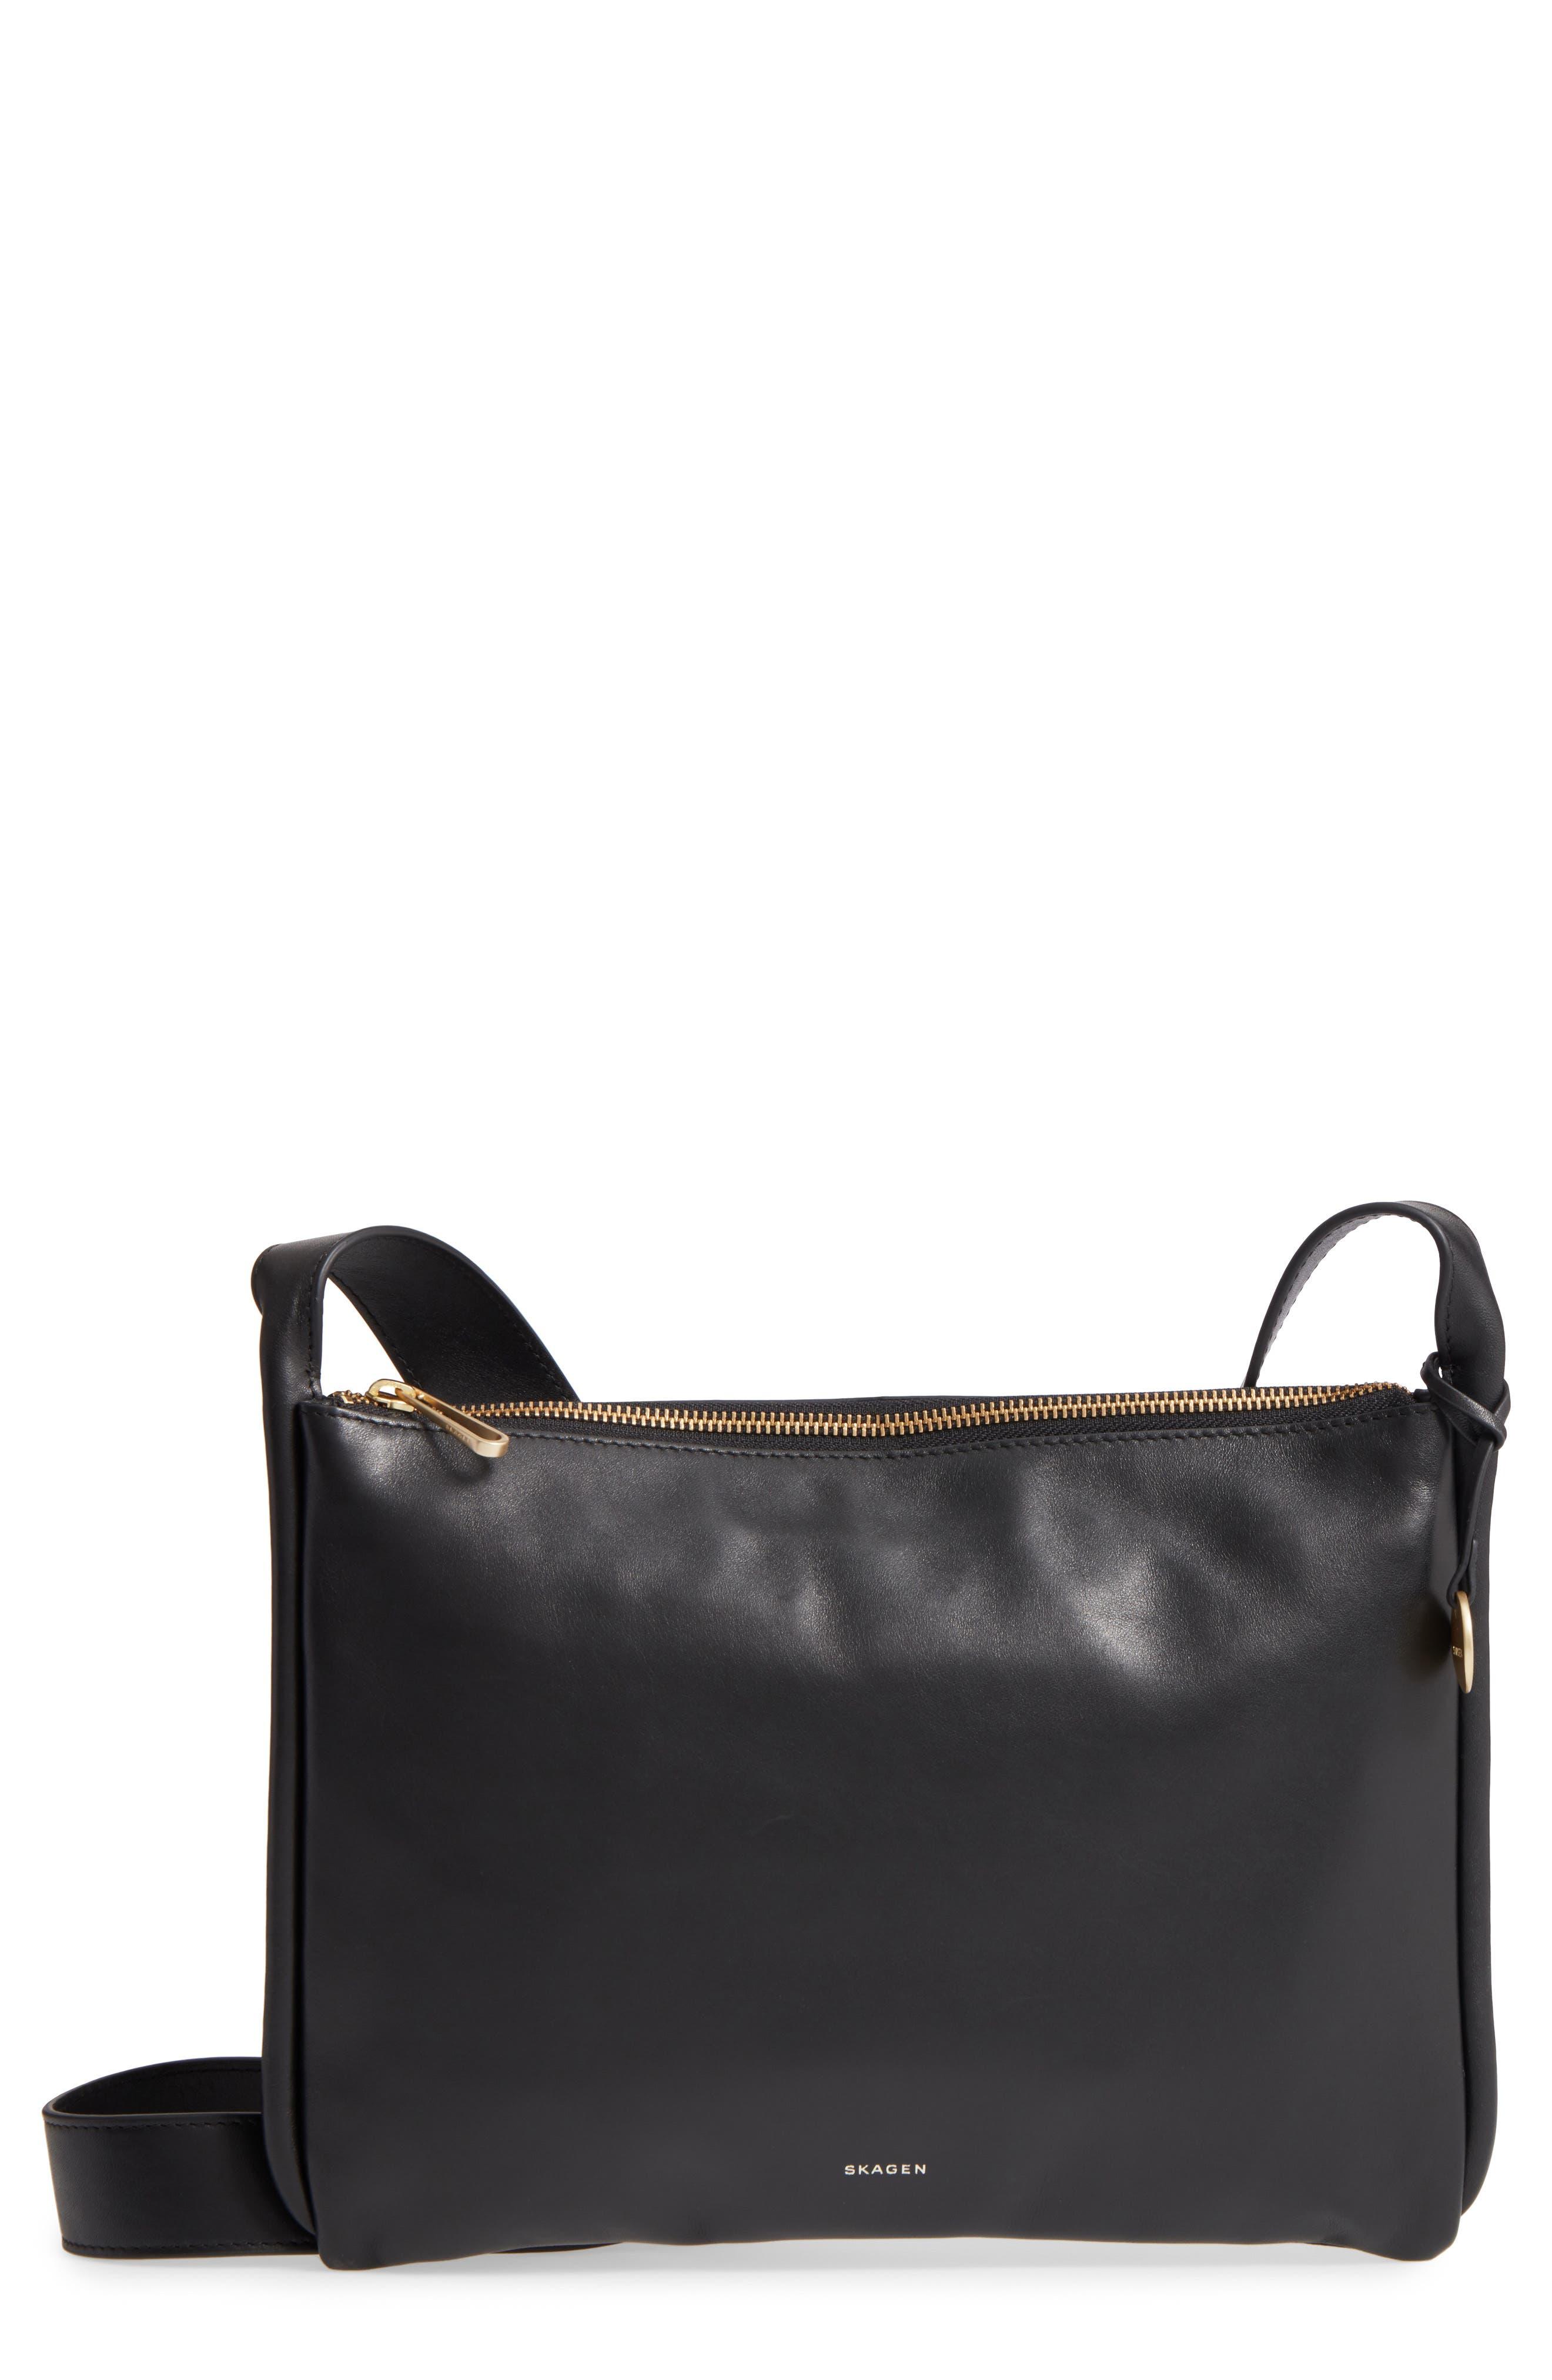 Alternate Image 1 Selected - Skagen Slim Anesa Leather Crossbody Bag